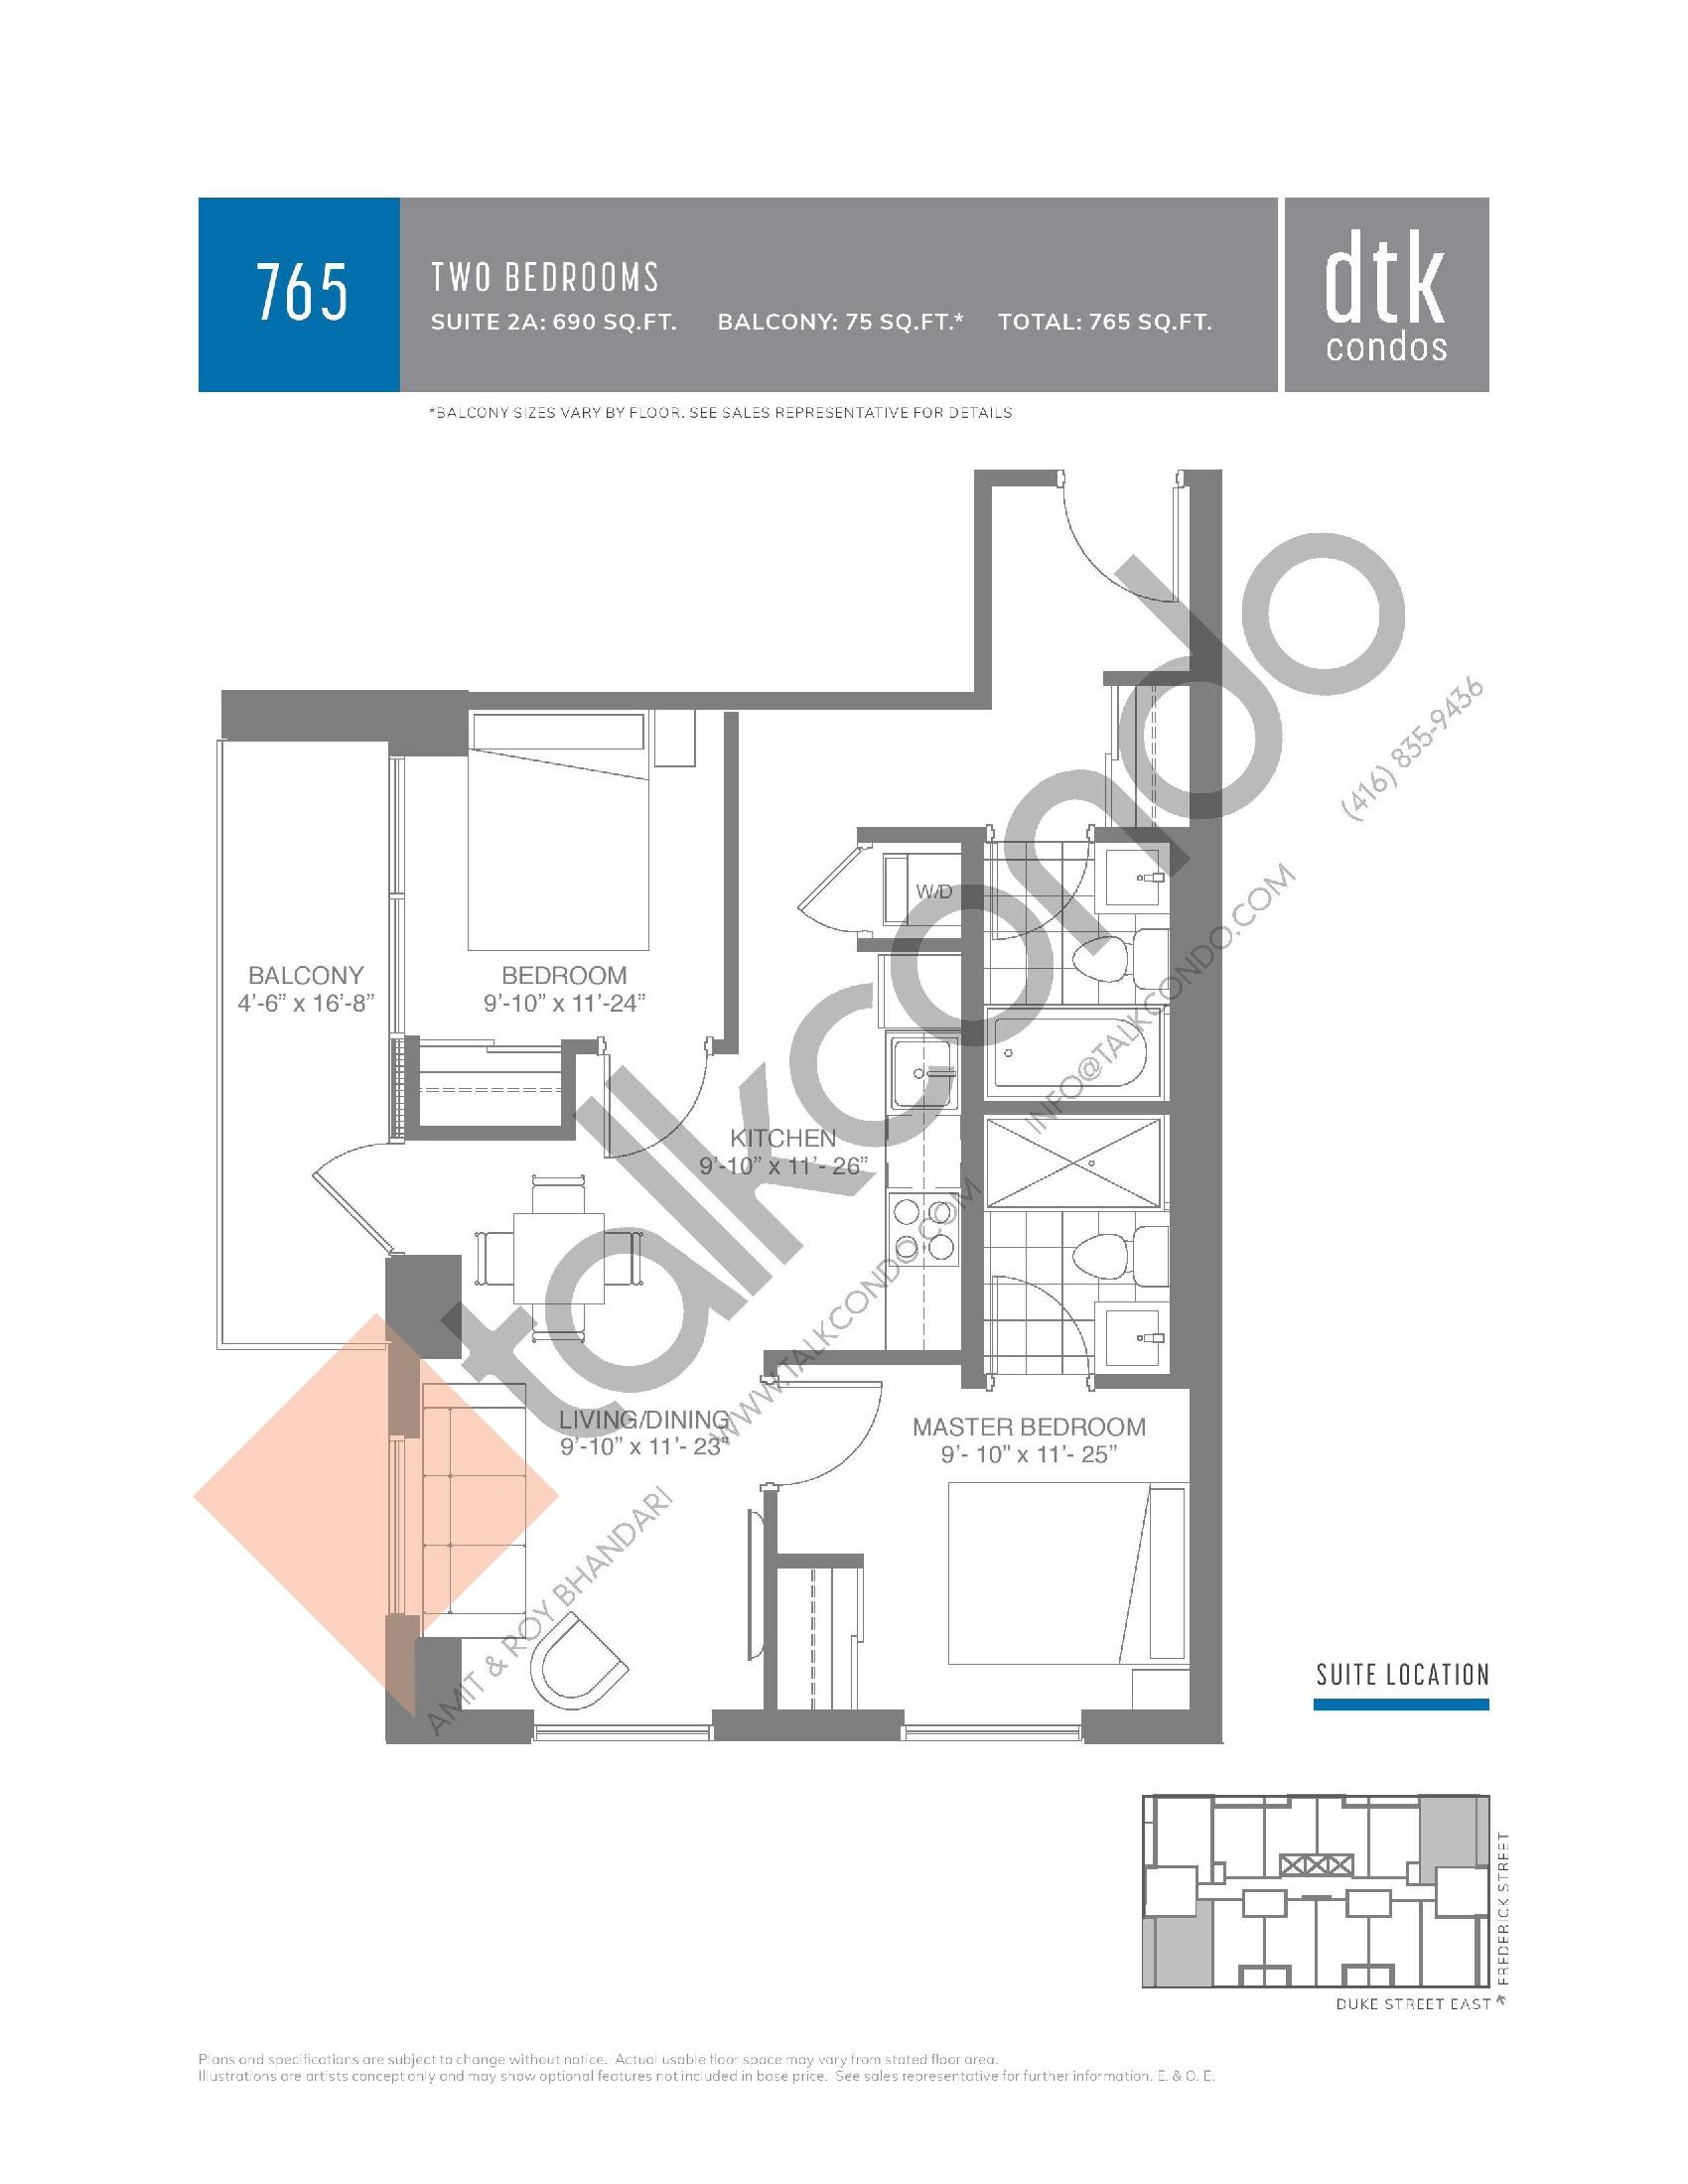 Dtk Condos Floor Plans Prices Availability Talkcondo